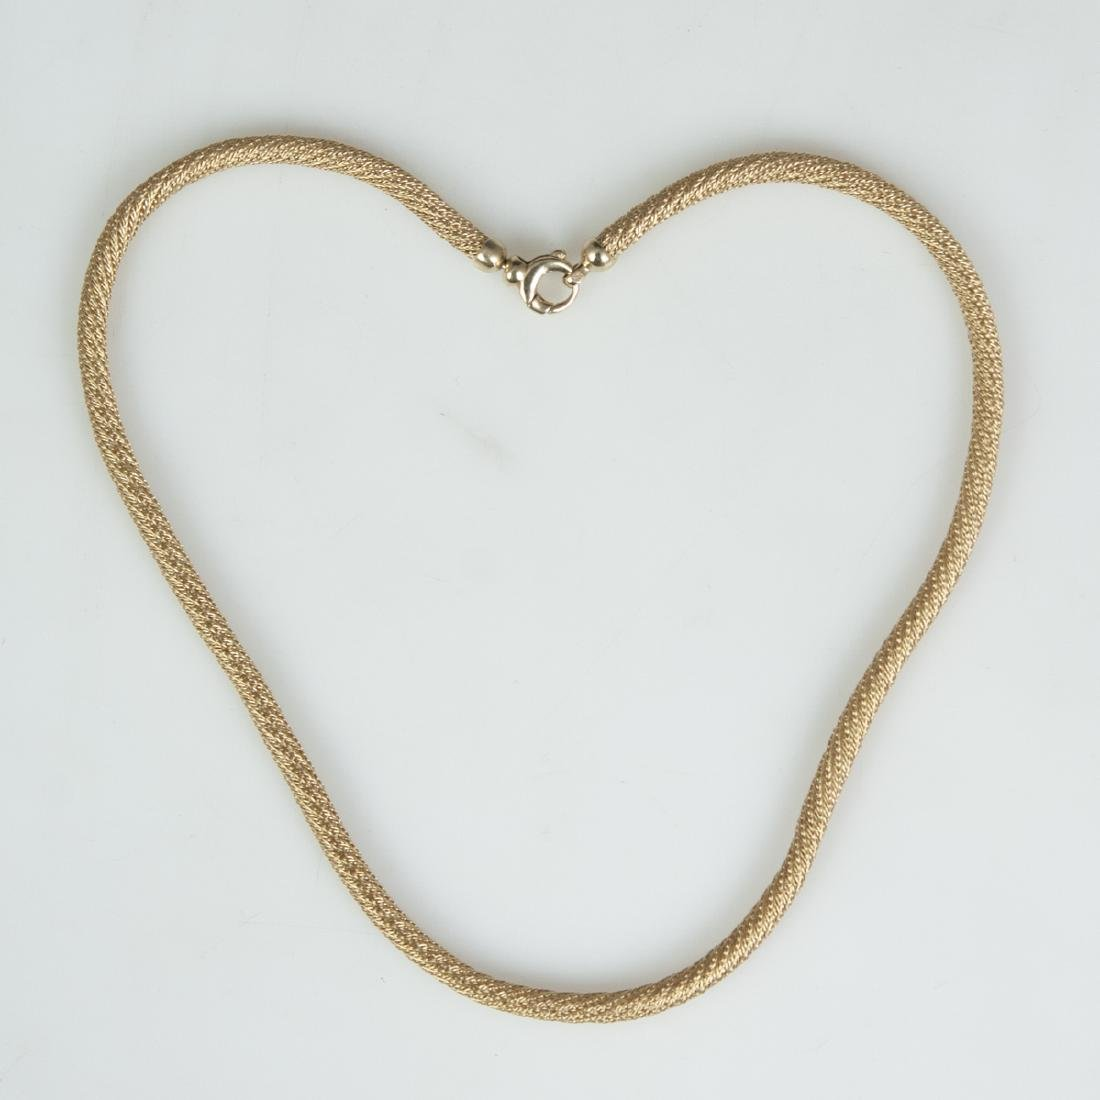 Vintage Italian 14kt Gold Necklace